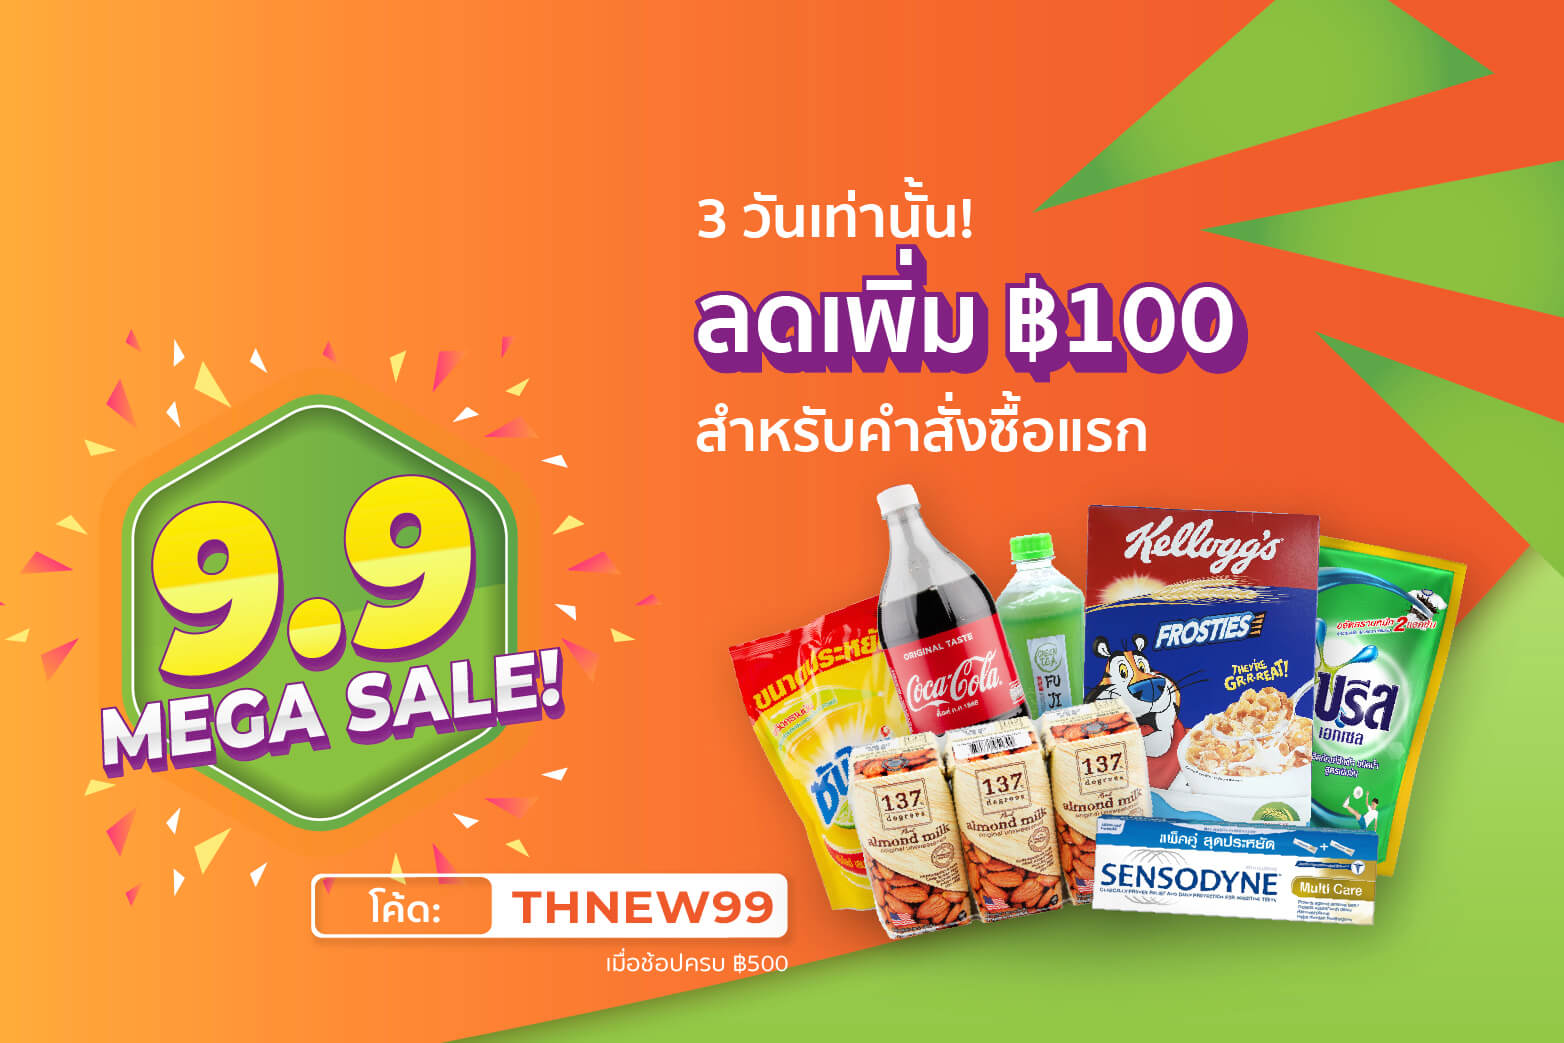 HappyFresh_Promotion_9_9_Discount_100_THB